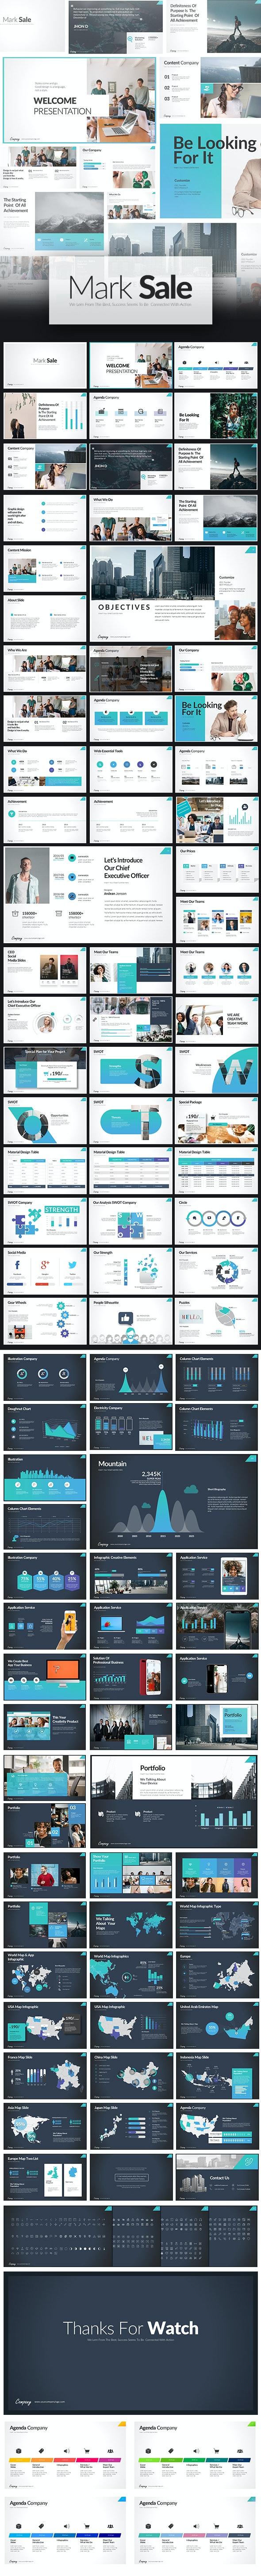 Mark Sale PowerPoint Presentation - Creative PowerPoint Templates